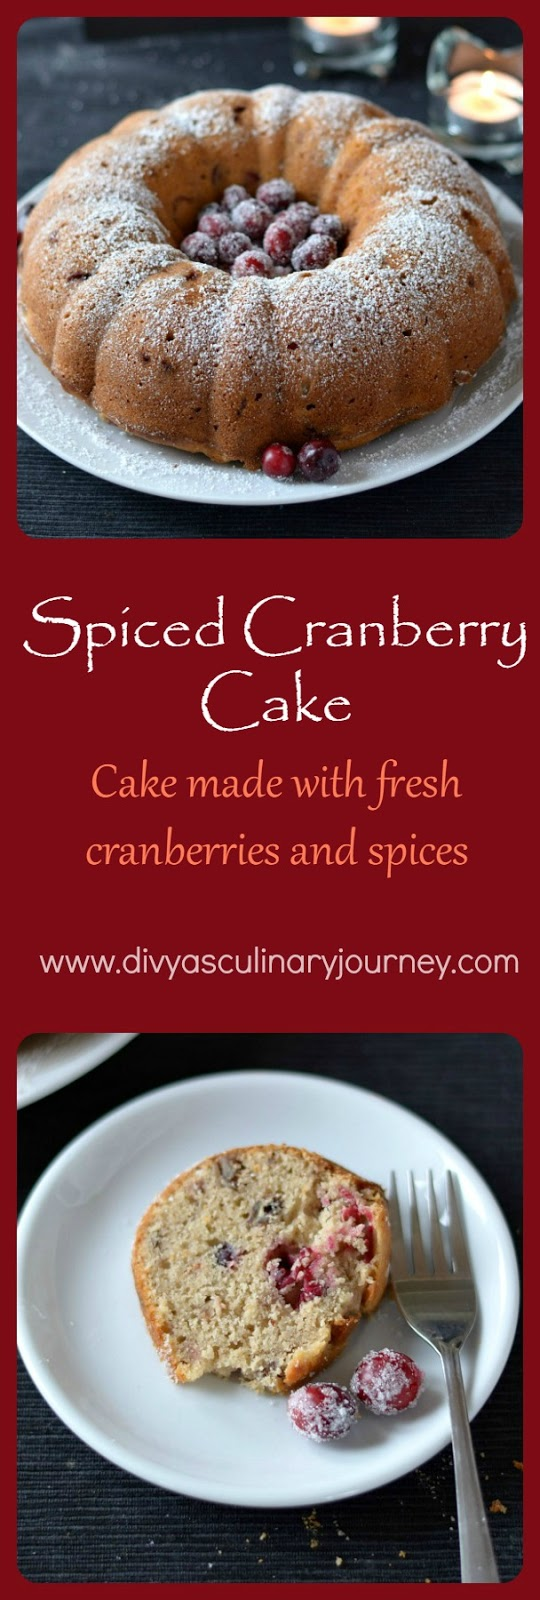 spiced cranberry cake, cranberry bundt cake